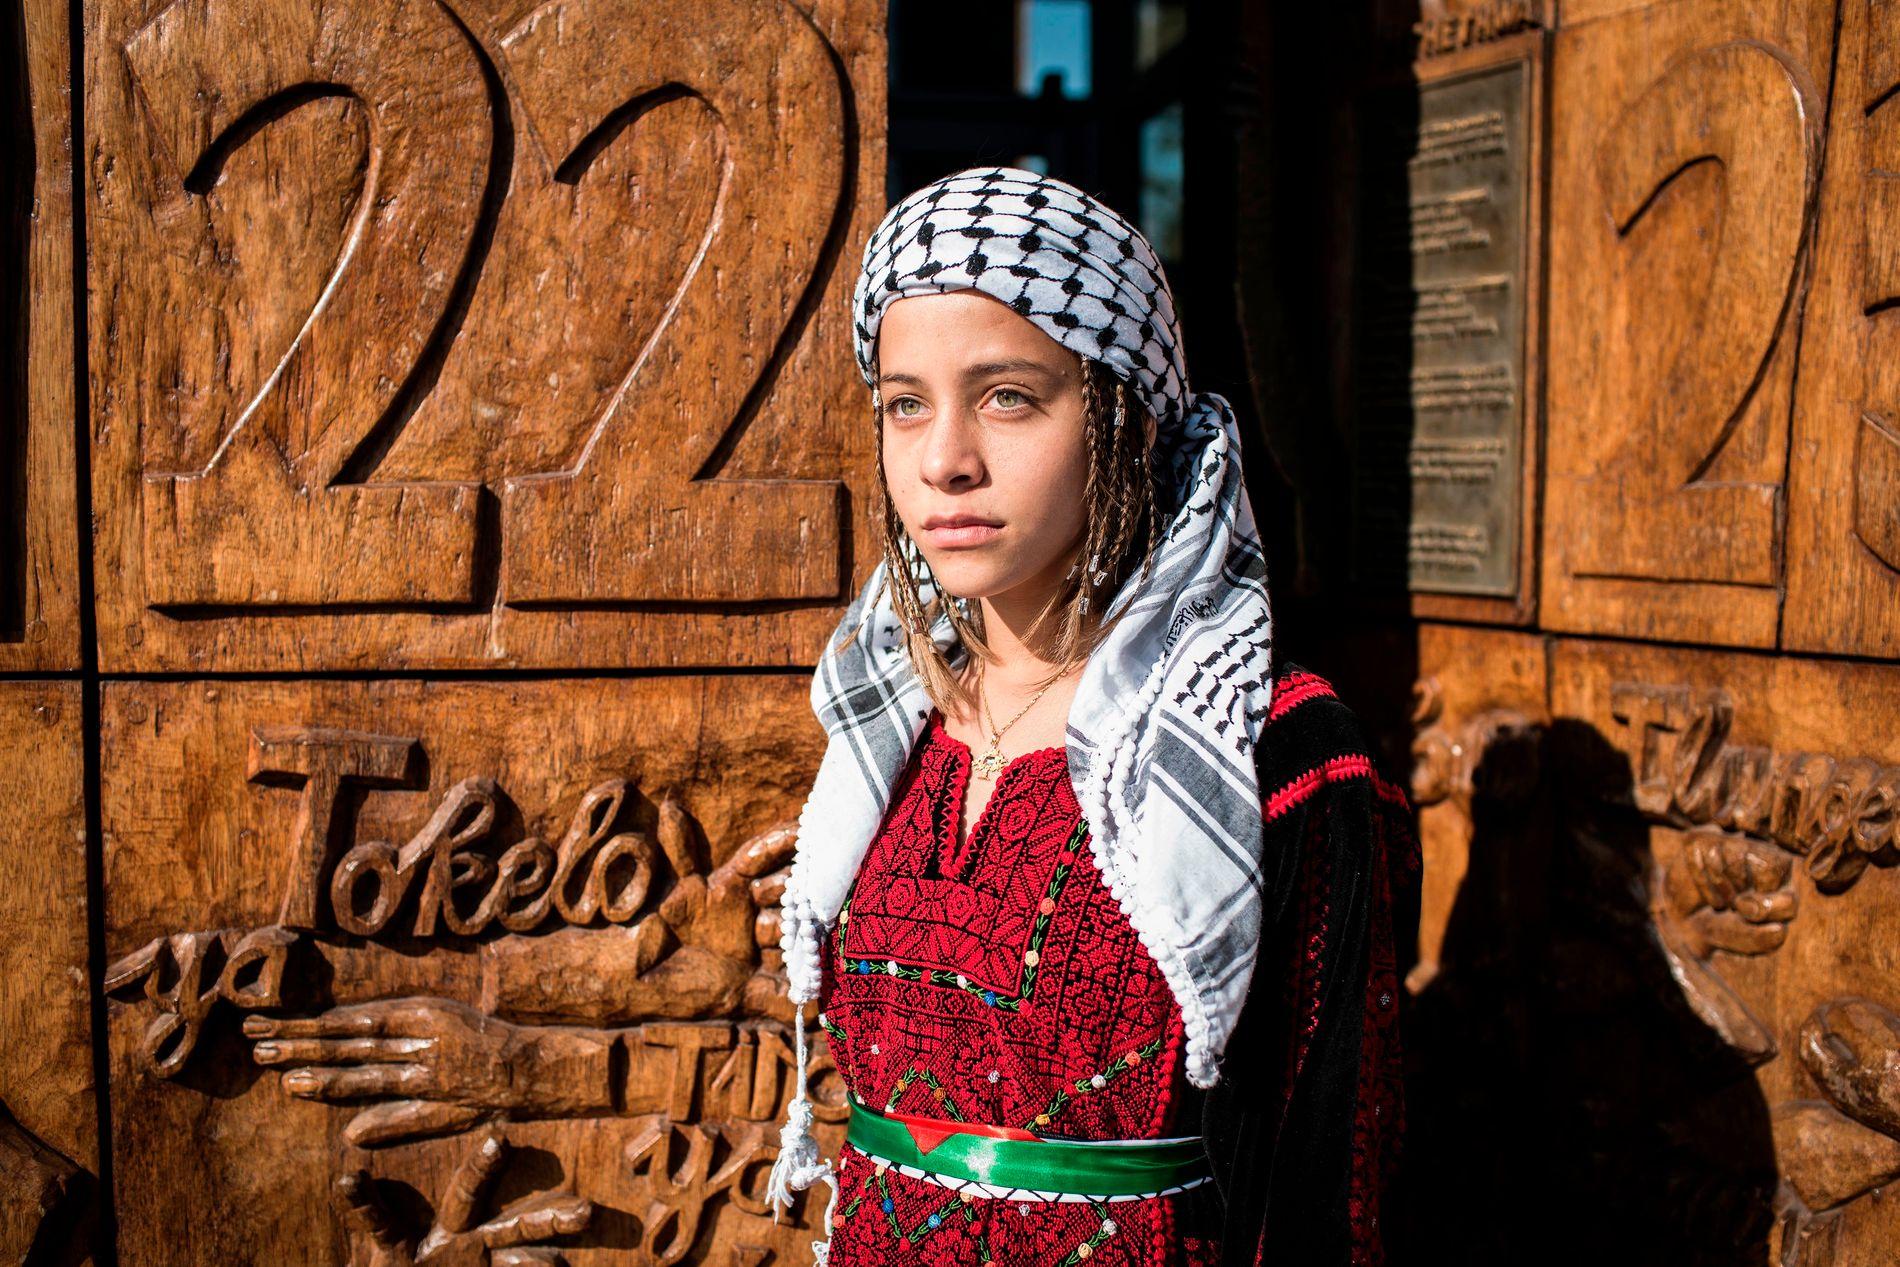 UNG STEMME: Janna Jihad blogger om livet på Vestbredden.